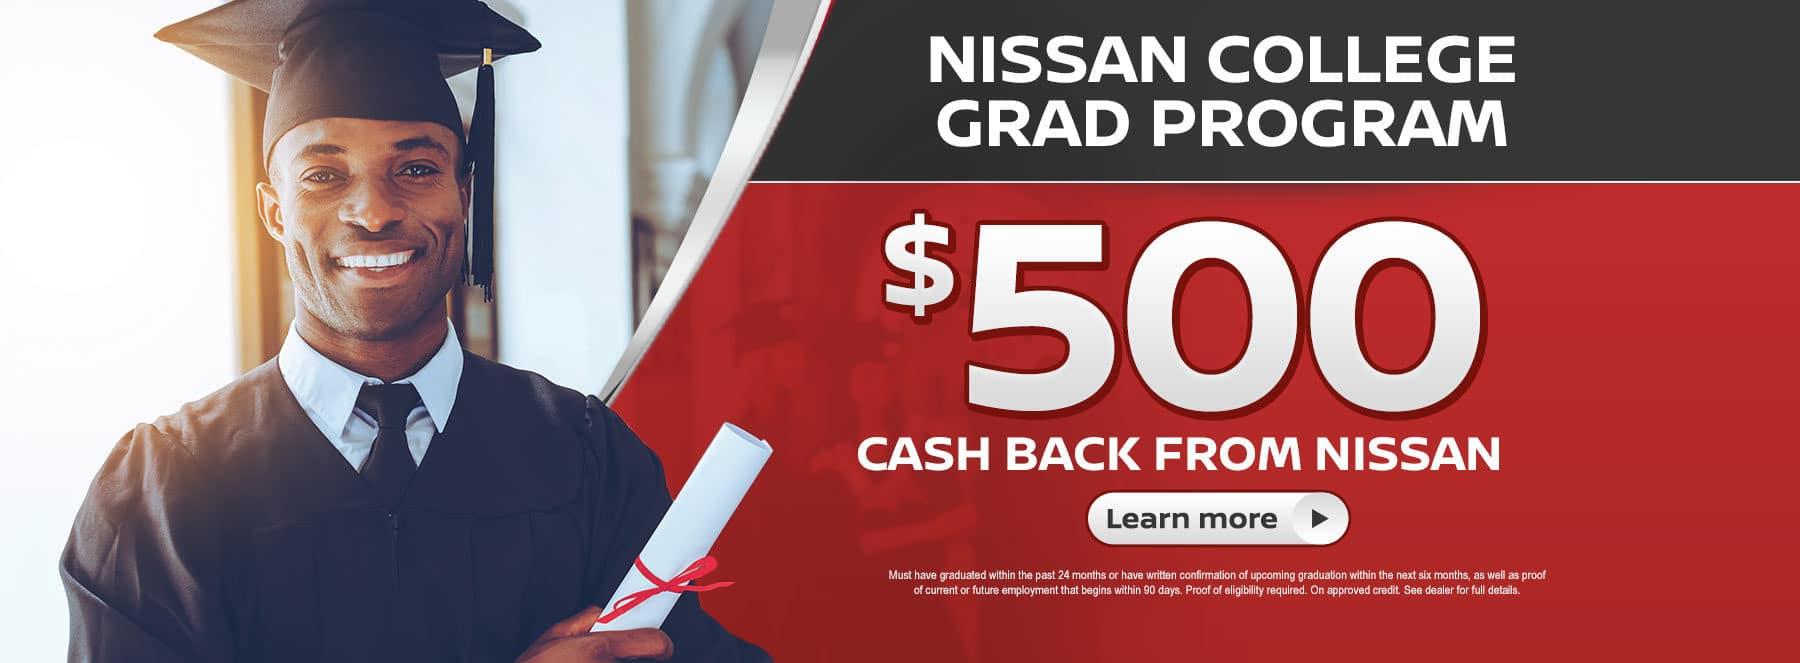 Nissan College Graduate Program Banner